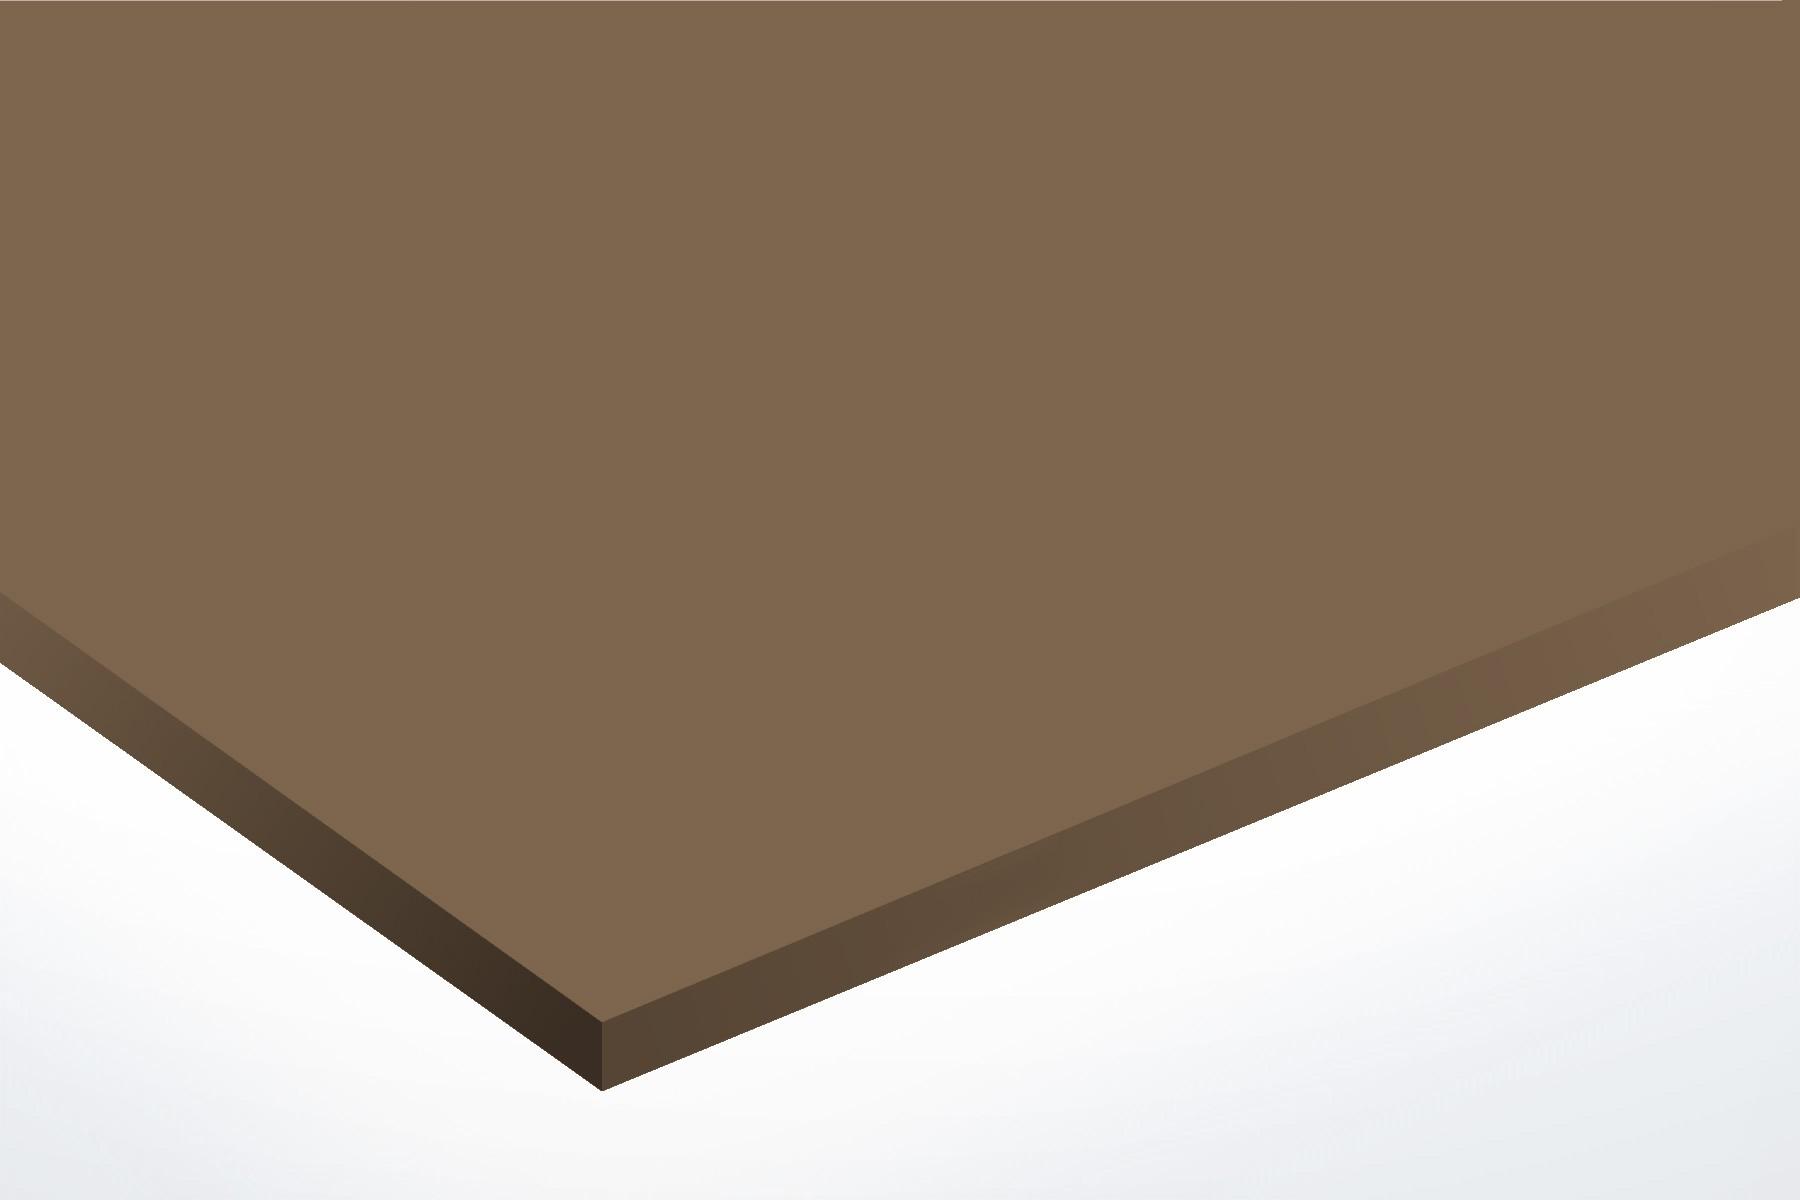 Anodised Aluminium Bronze, Matte, 1mm x 1000mm x 500mm